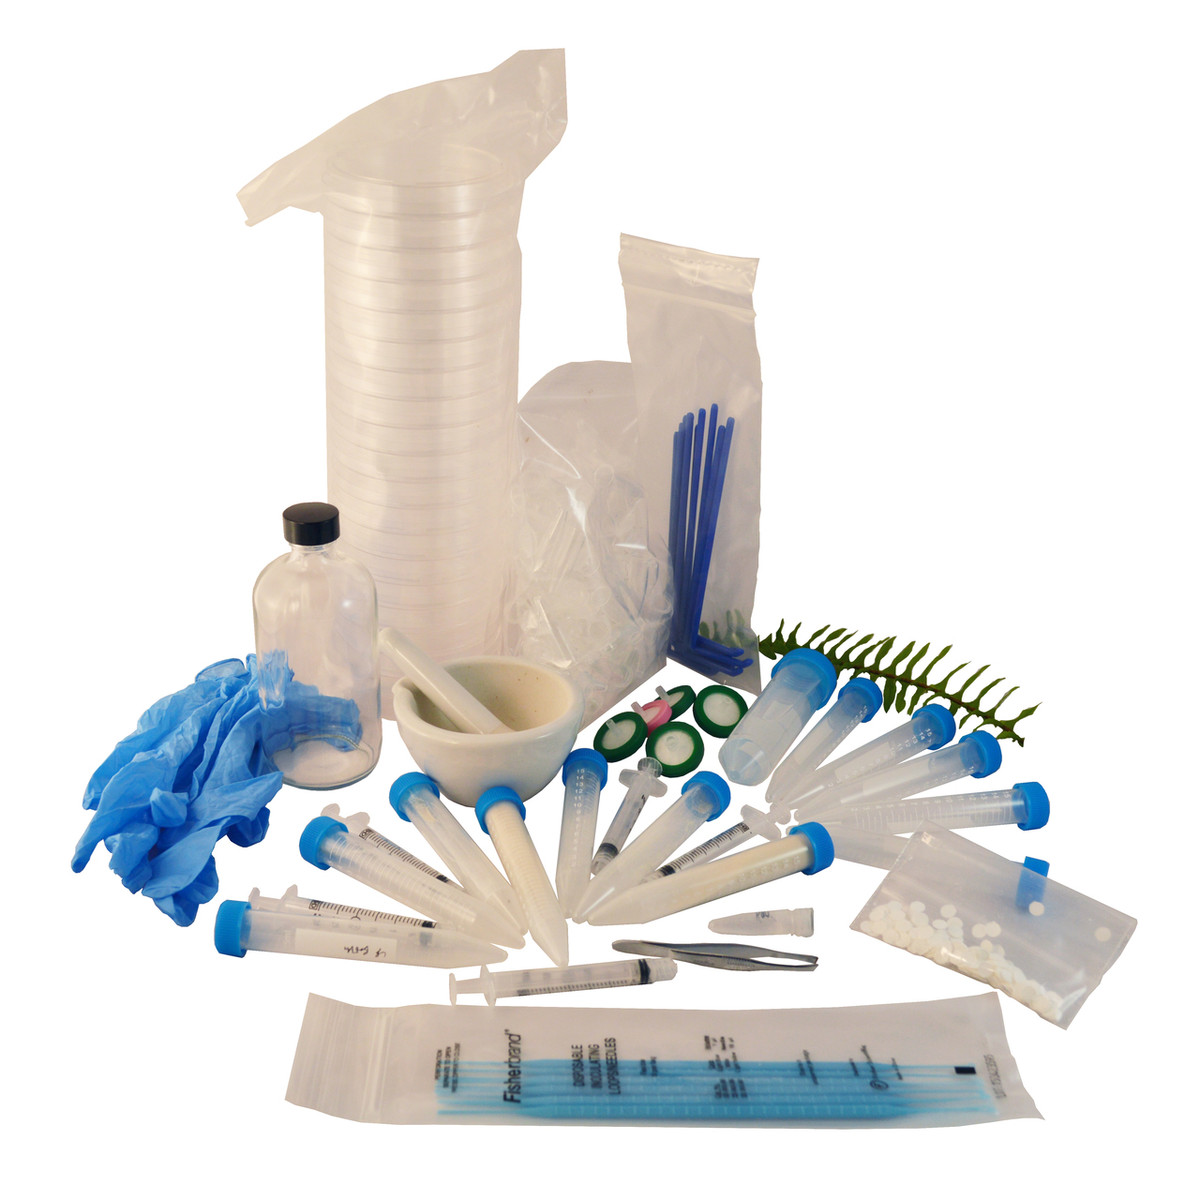 The ILIAD Project Kit - Find New Antibiotics at Home